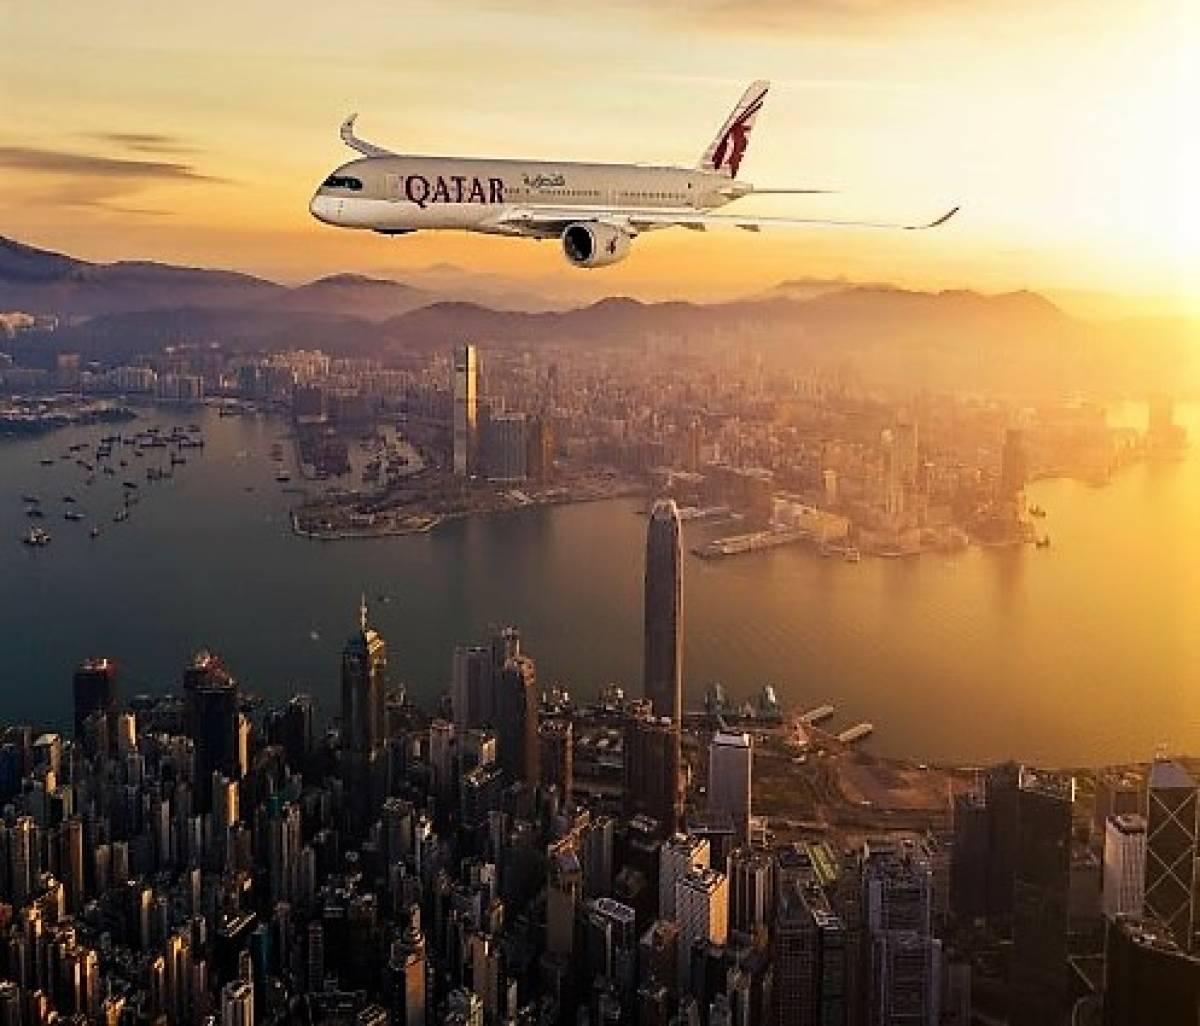 Qatar Airways Launches Ferry Transfer Service from Shenzhen Shekou to Hong Kong International Airport